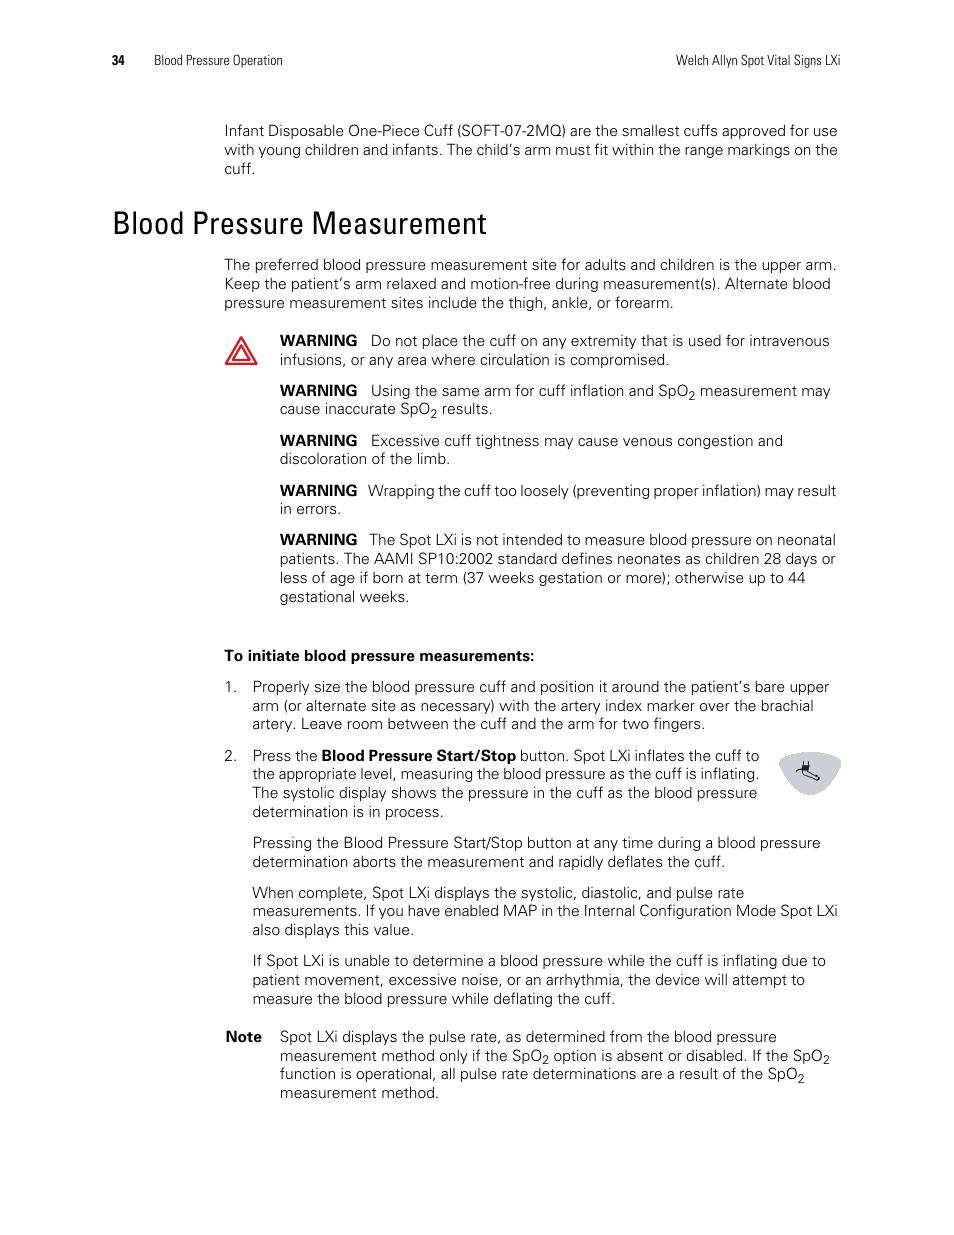 blood pressure measurement welch allyn spot vital signs lxi user rh manualsdir com alto 800 lxi user manual maruti alto lxi user manual pdf